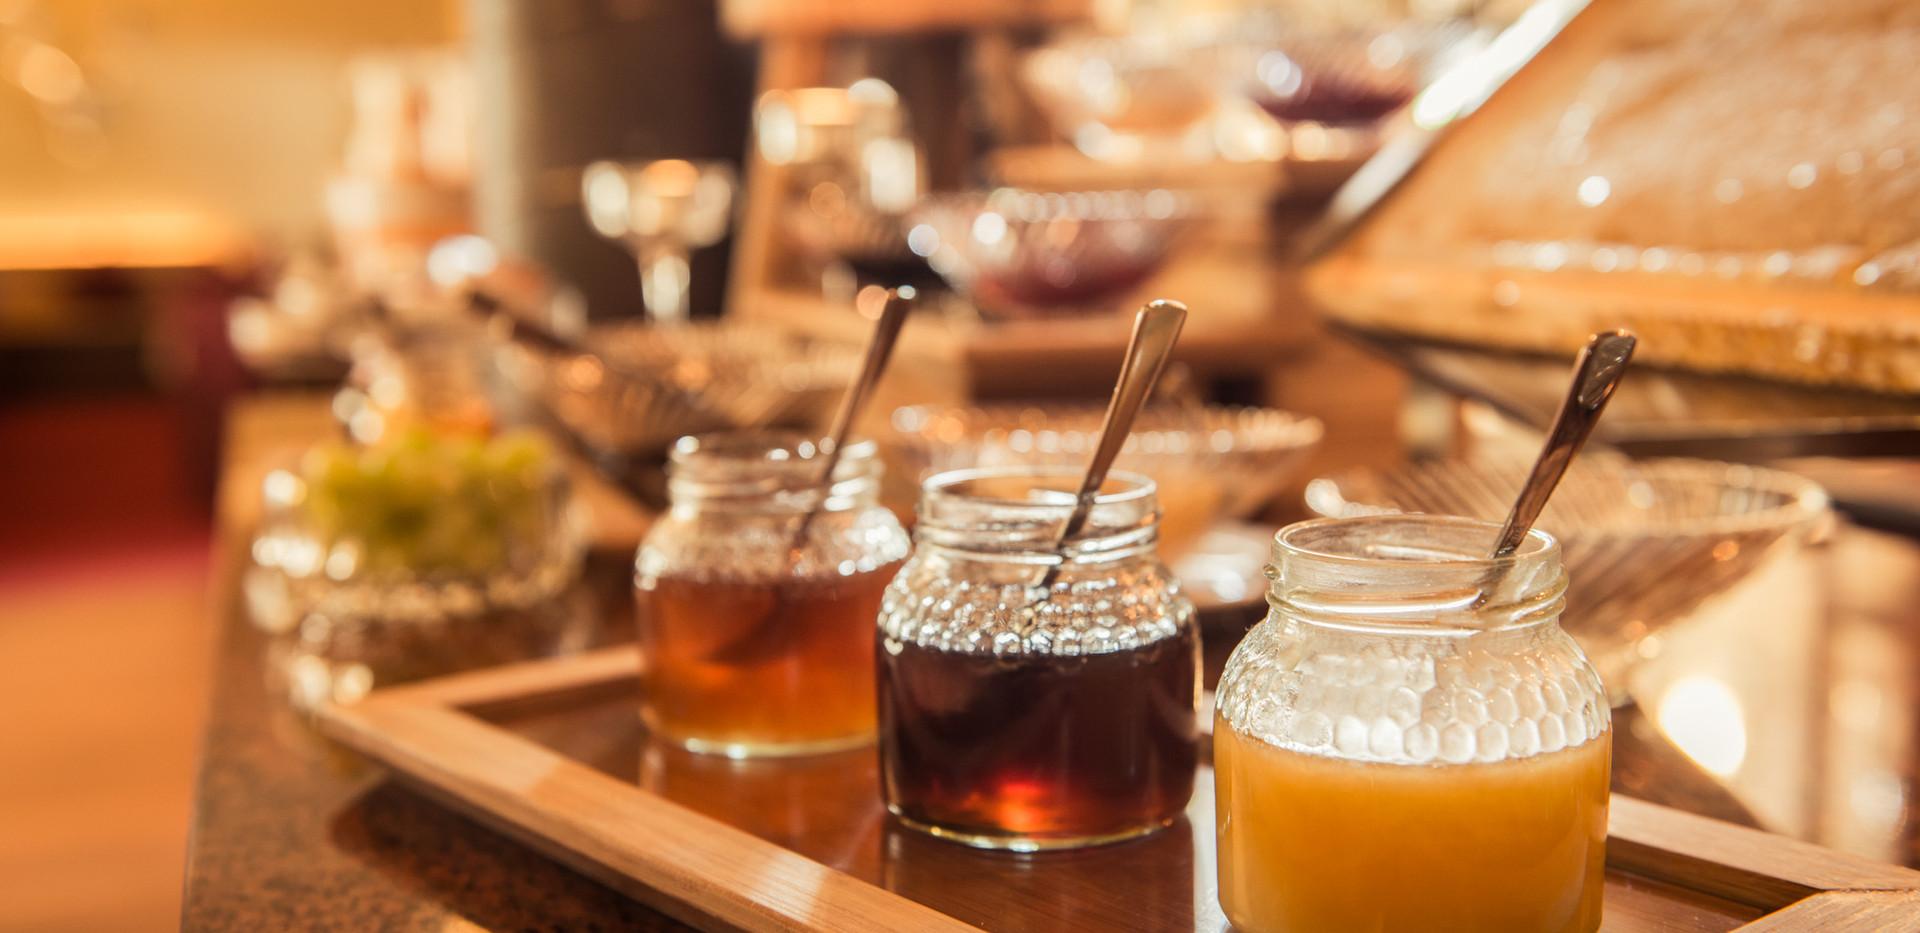 Honig und Marmelade Frühstücks-Manufaktur